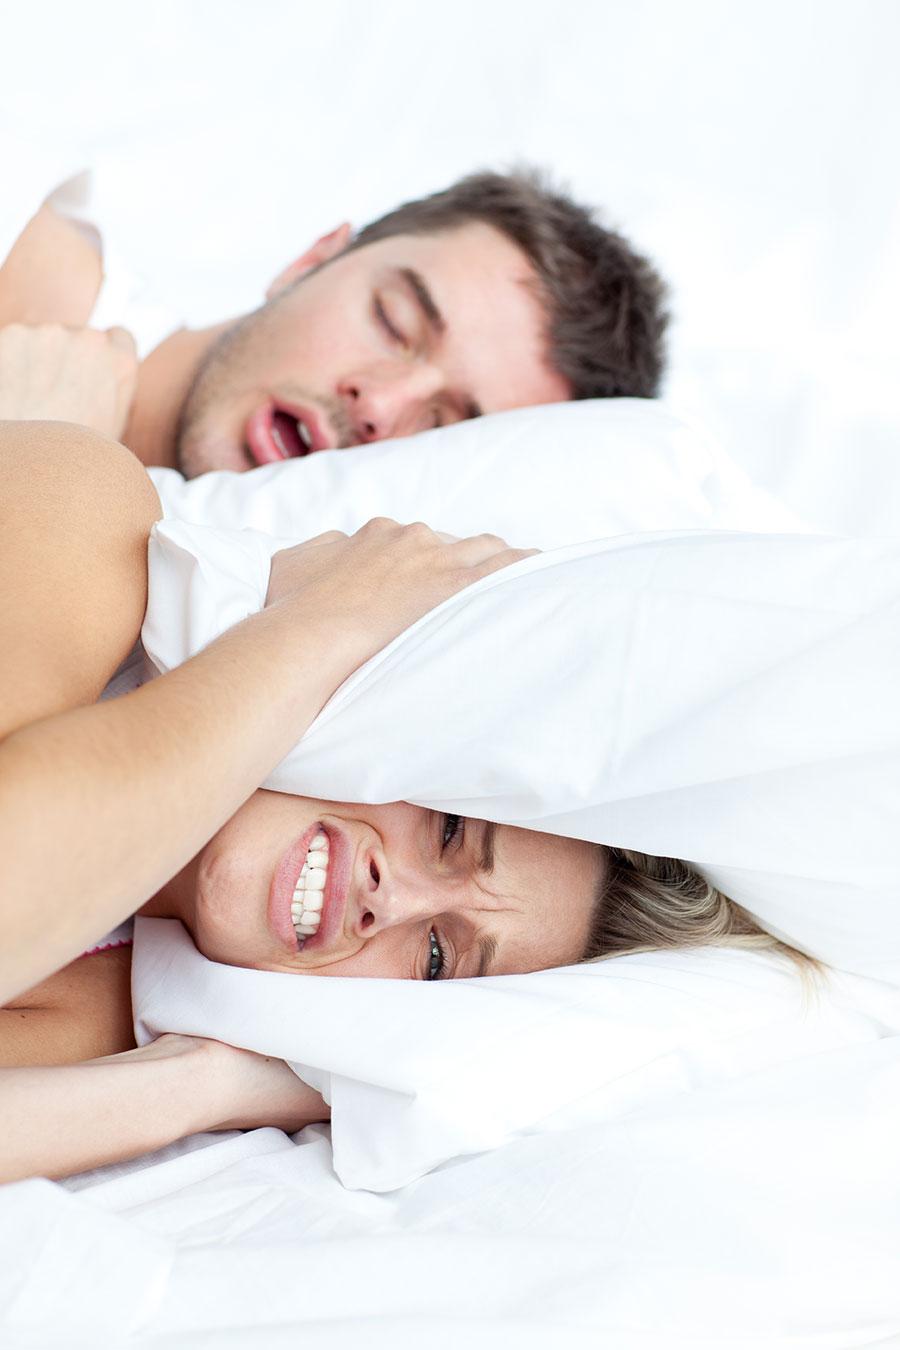 Sleep apnea, snoring and groaning